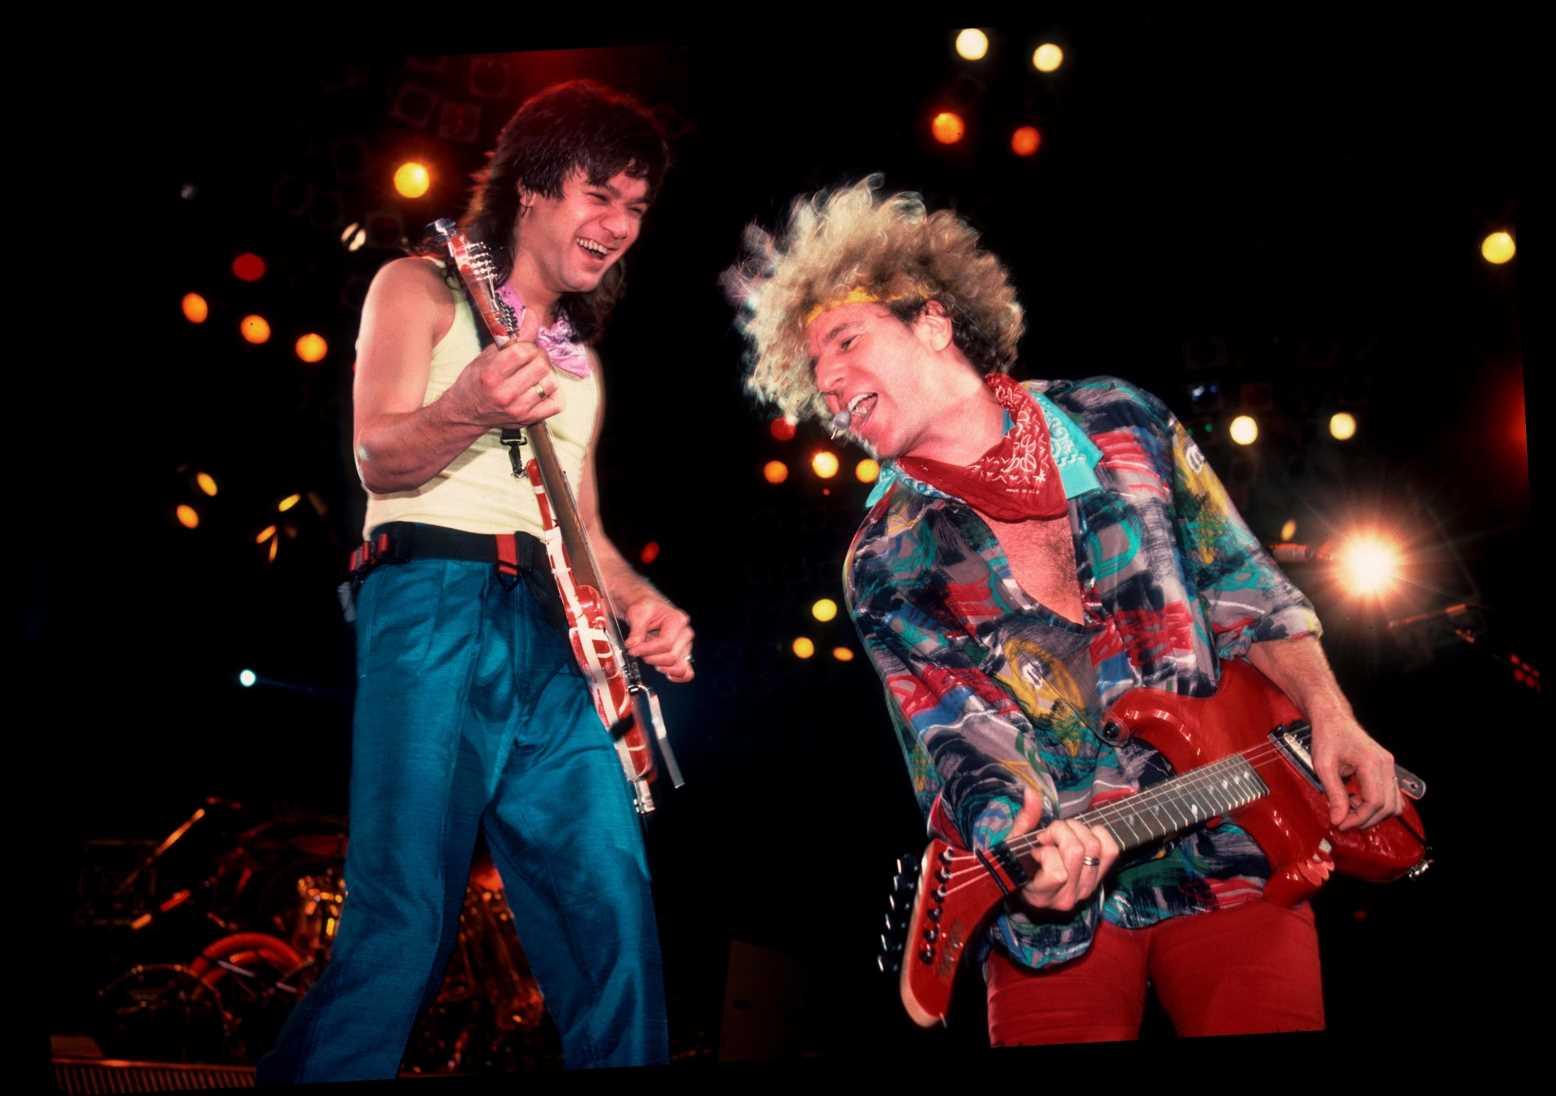 Sammy Hagar and Eddie Van Halen finally made peace during final phone call